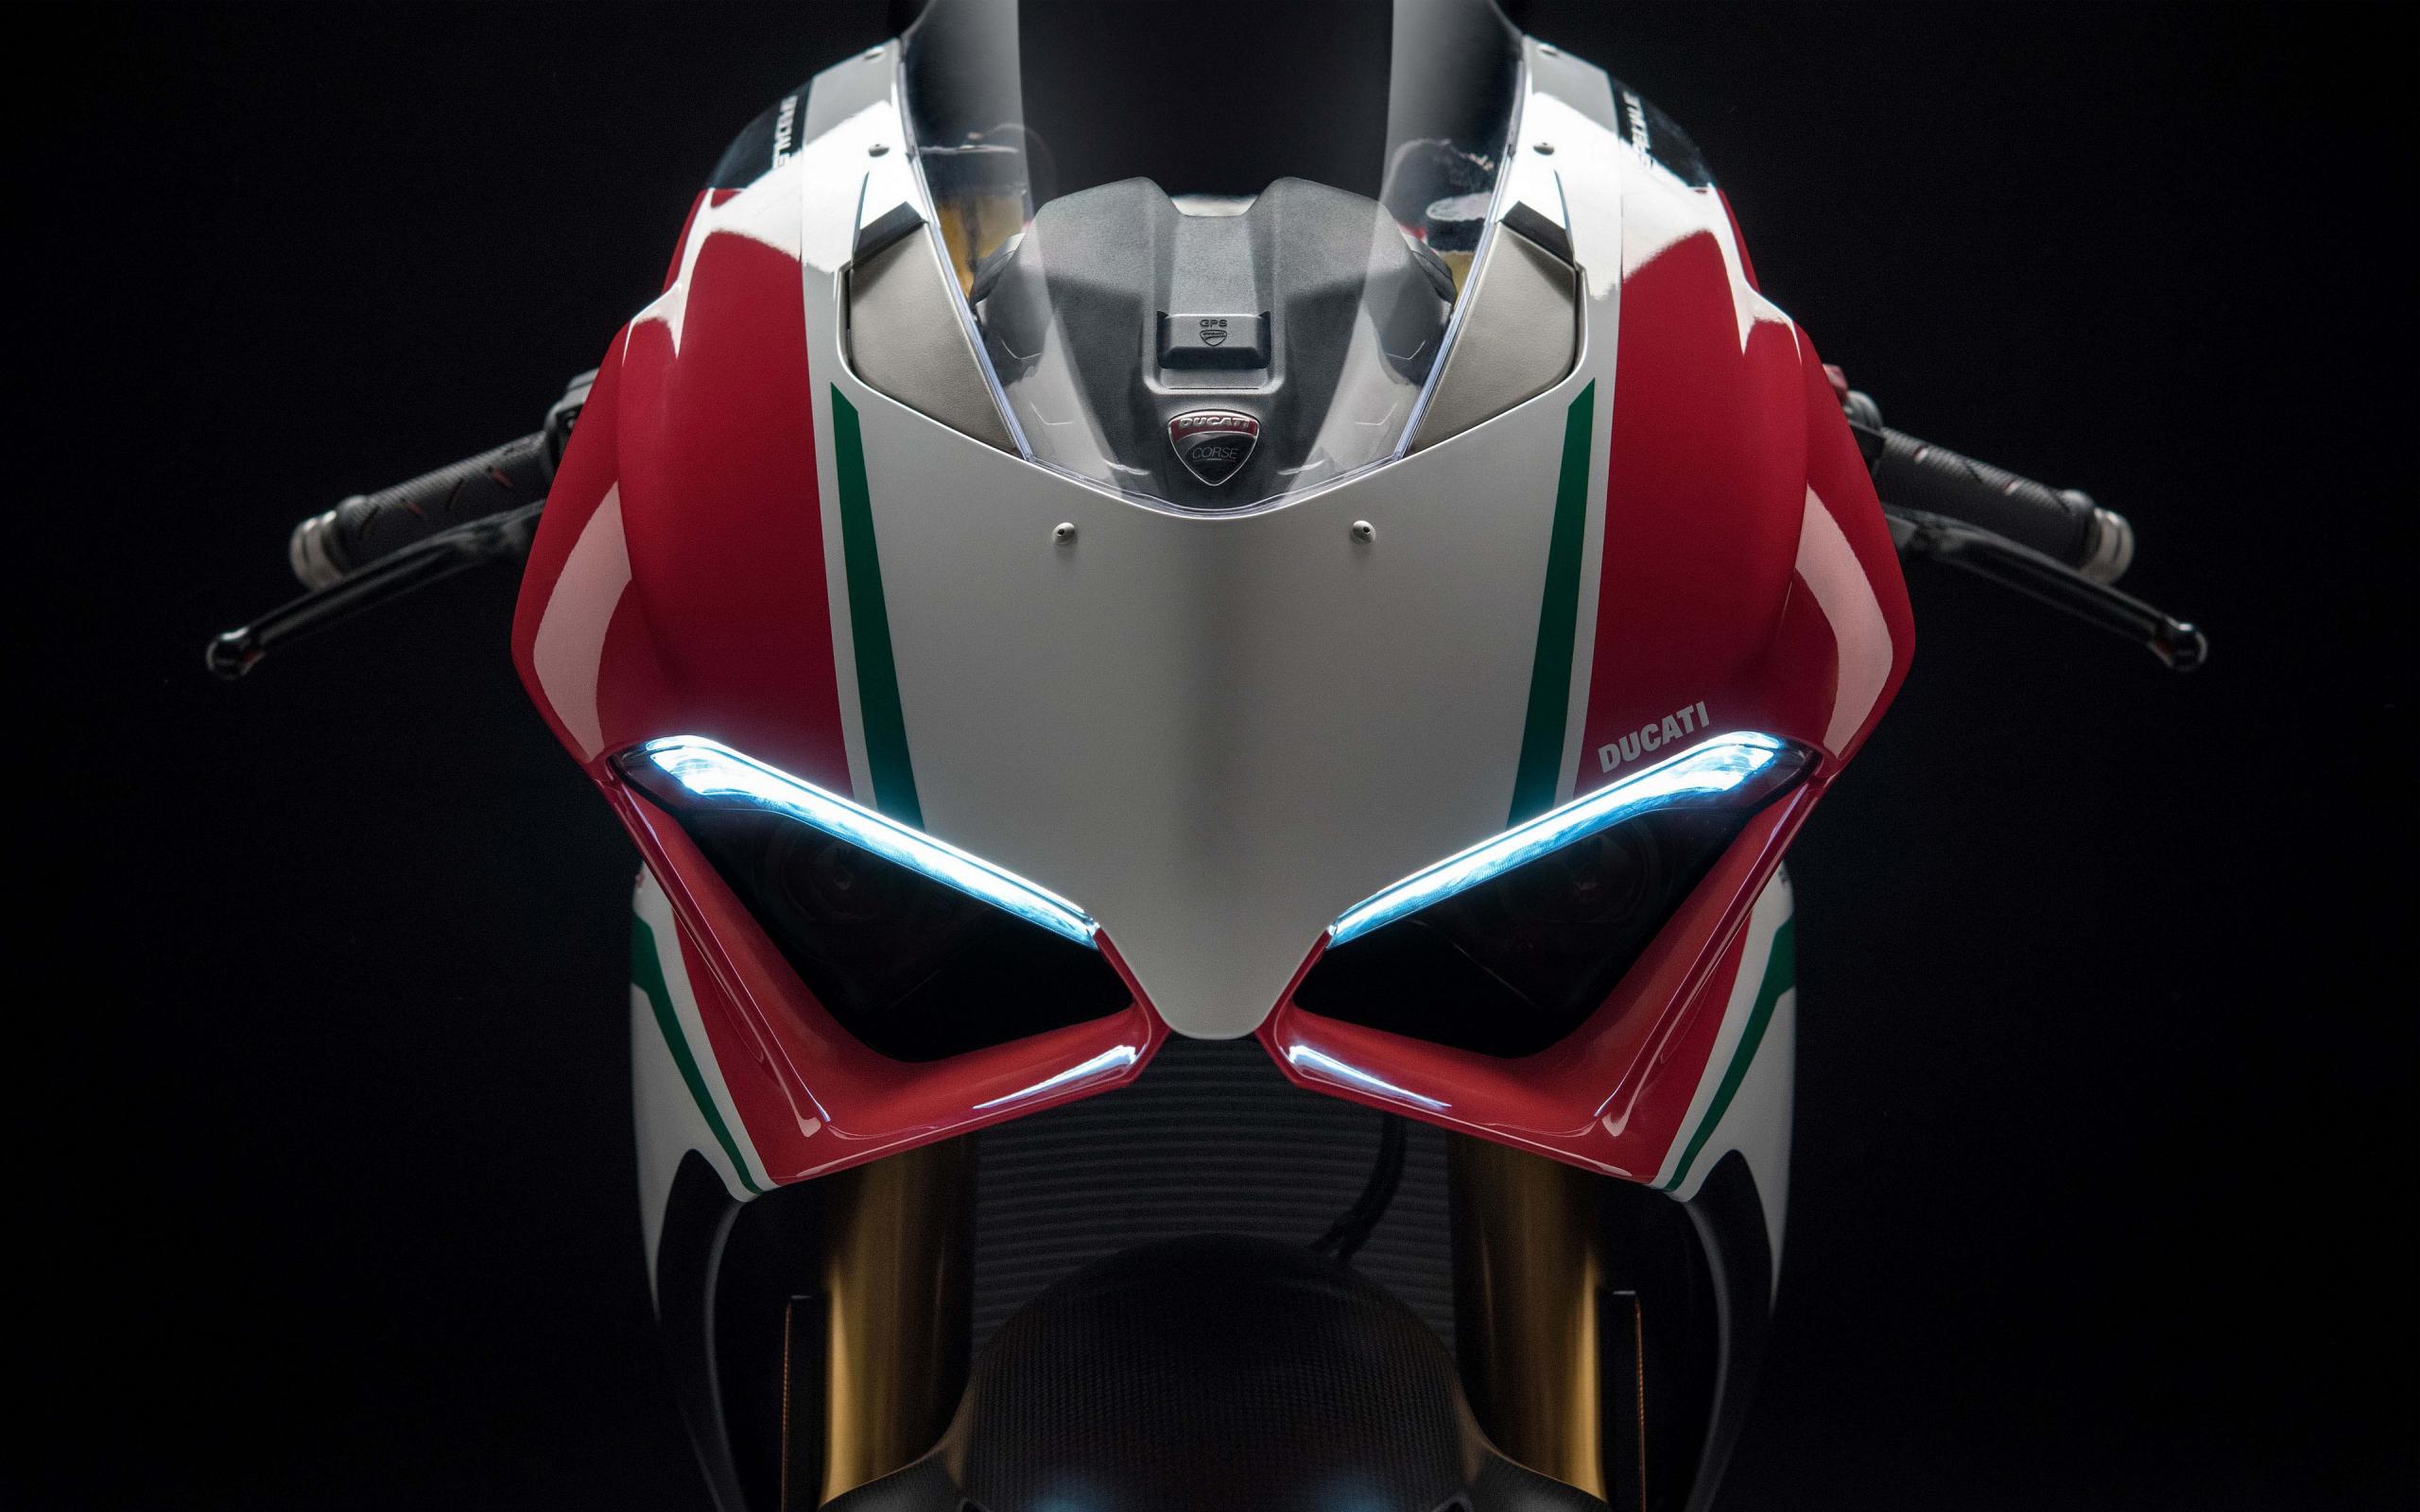 2560x1600 wallpaper 2018 Ducati Panigale V4, superbike, 4k